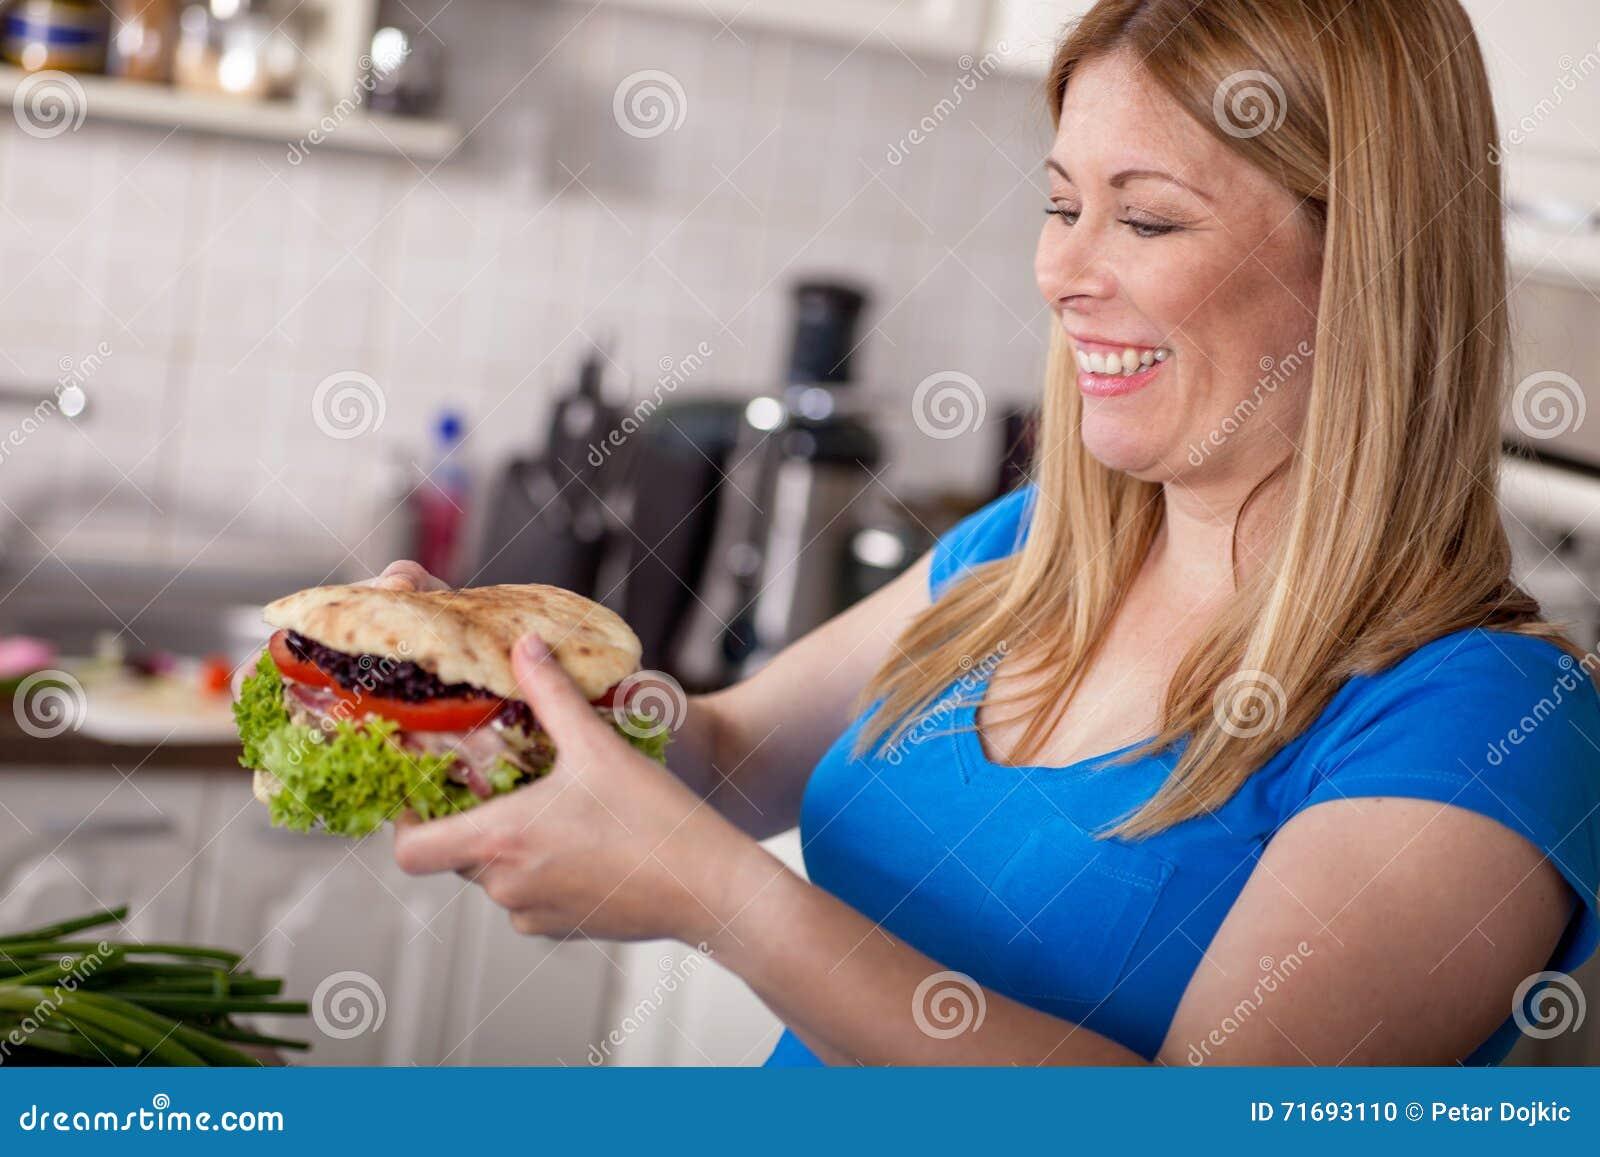 hungry pregnant woman eating a big burgerjunk food stock